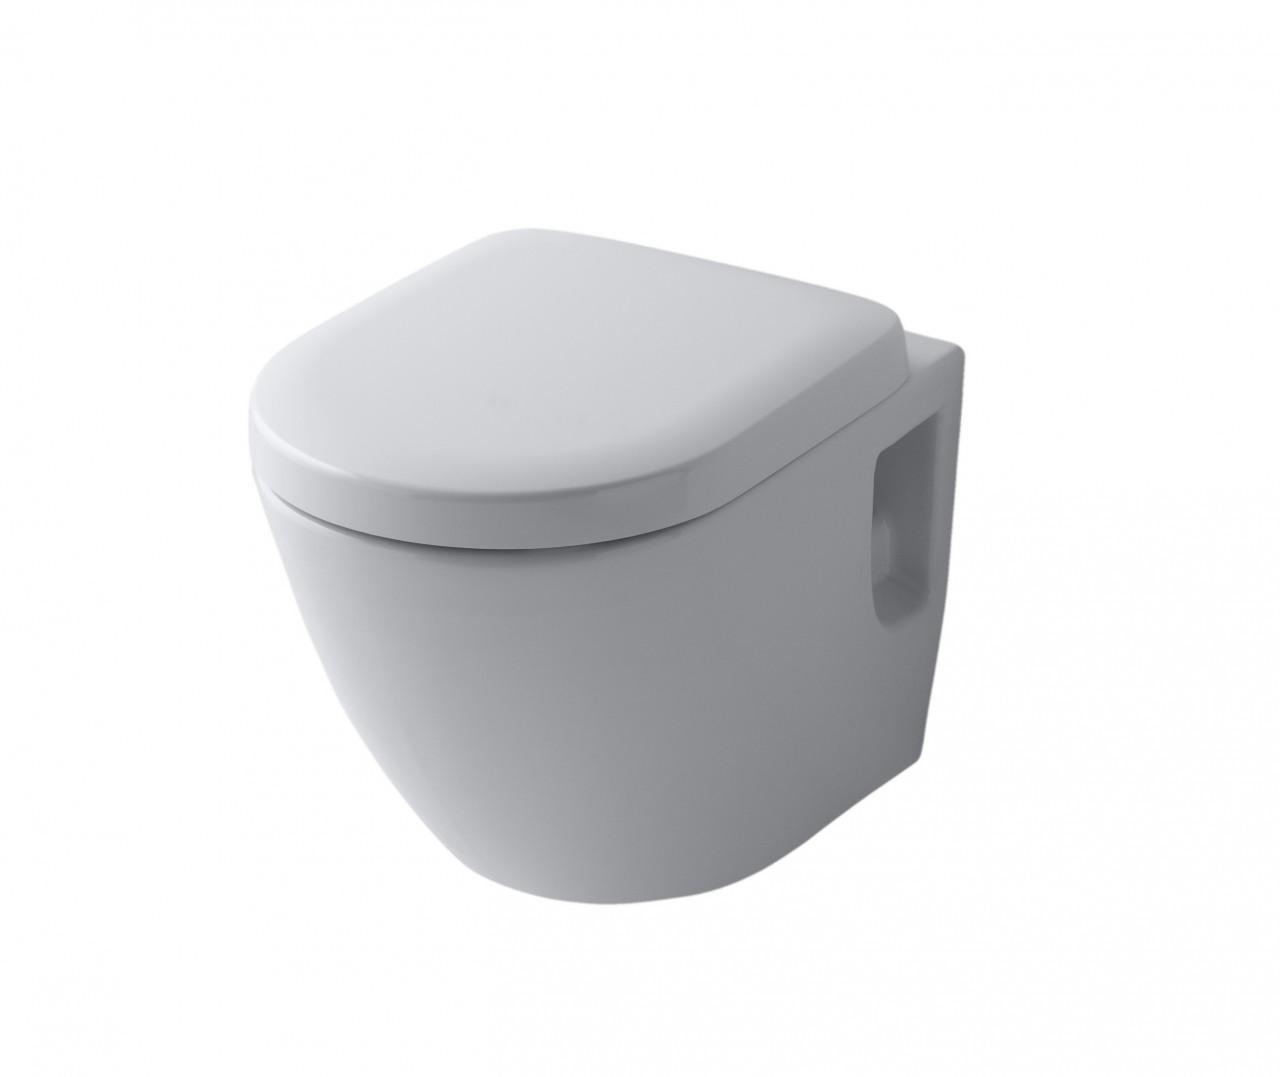 Wand-Tiefspül-WC, NC Series TOTO CW762Y, günstig